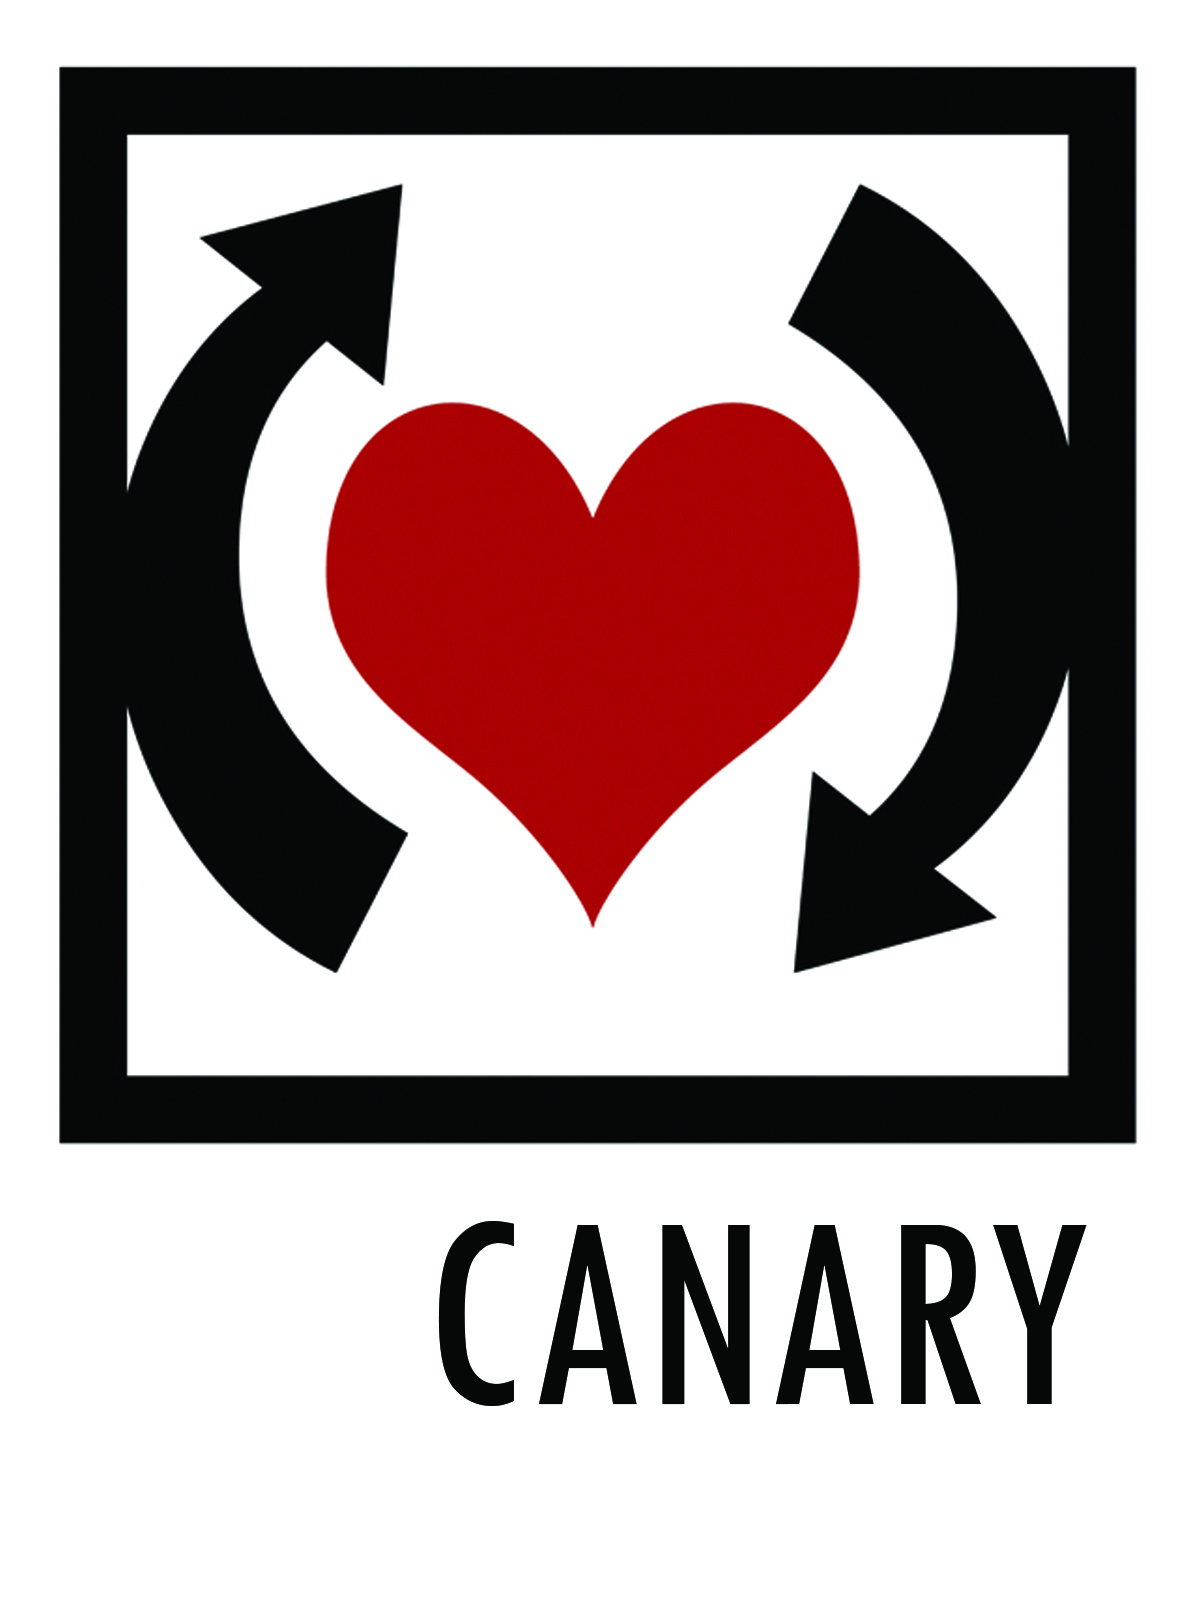 Canary 2009 Imdb